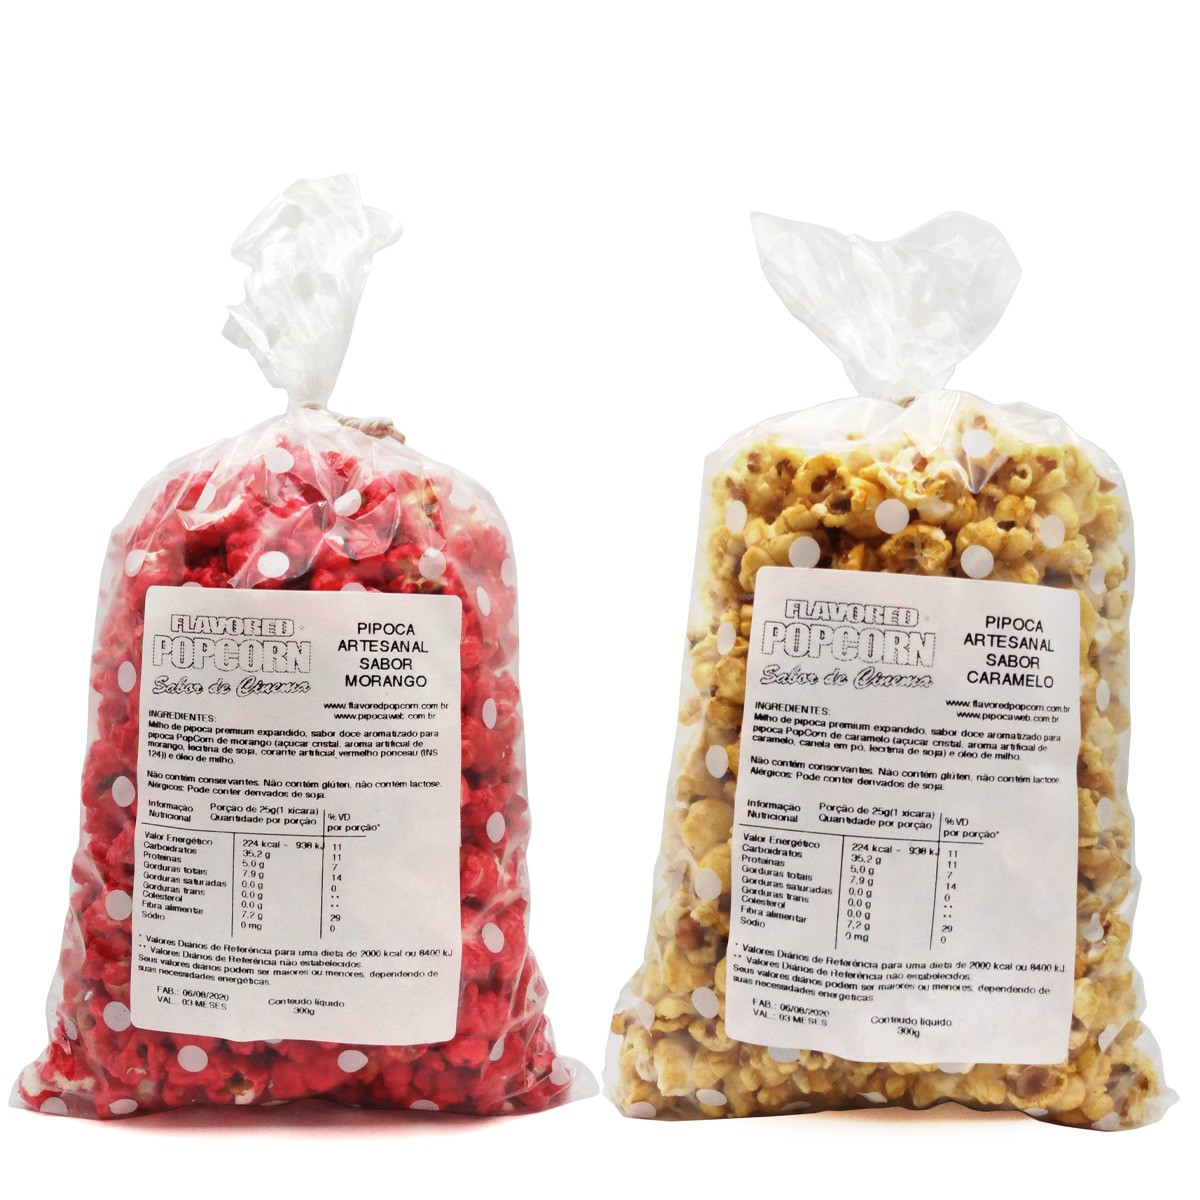 Pipoca Artesanal Popcorn - 18 Sabores Doces e 21 Sabores Salgados + balde de pipoca